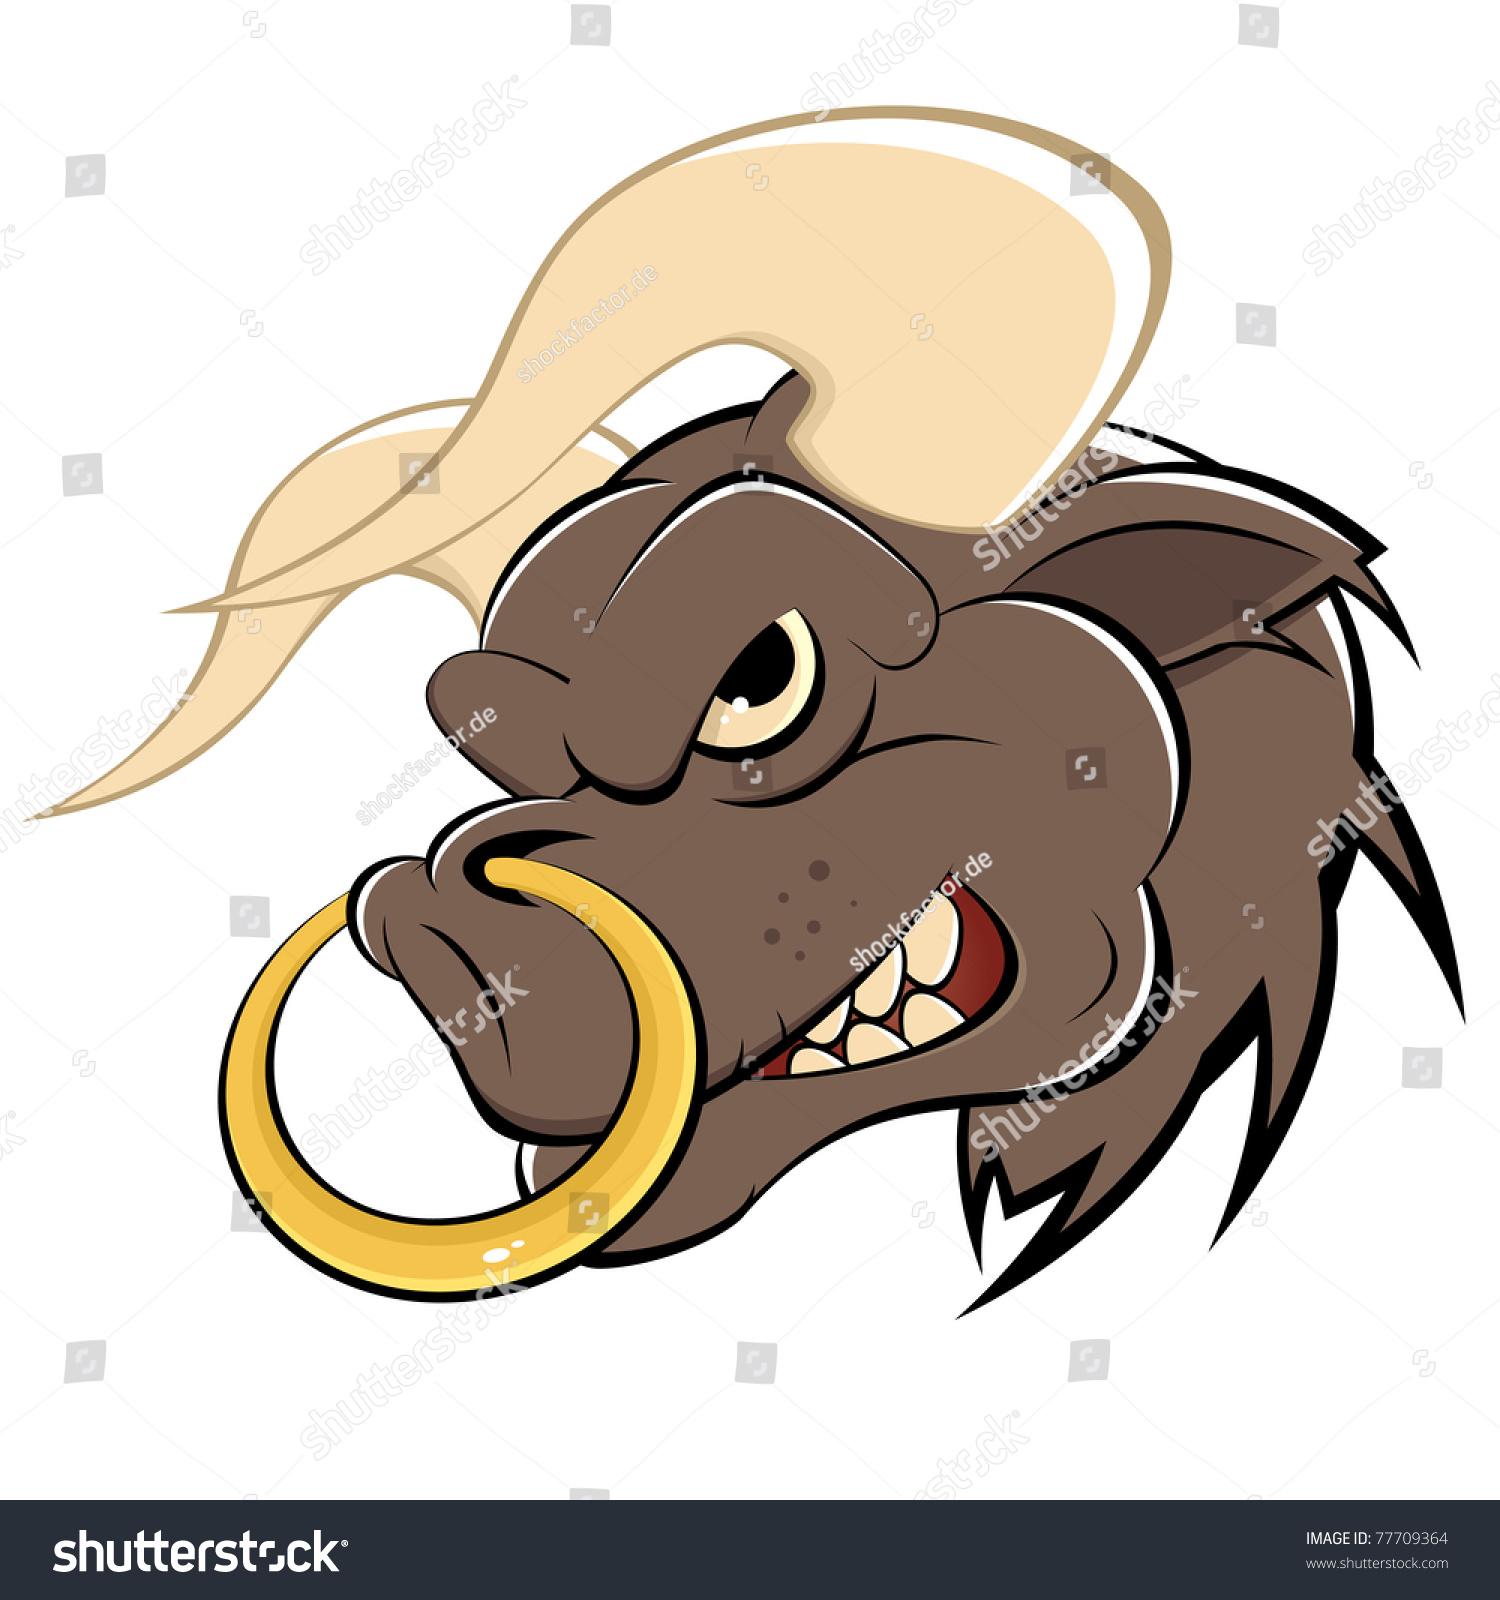 Angry Cartoon Bull Stock Vector Illustration 77709364 : Shutterstock